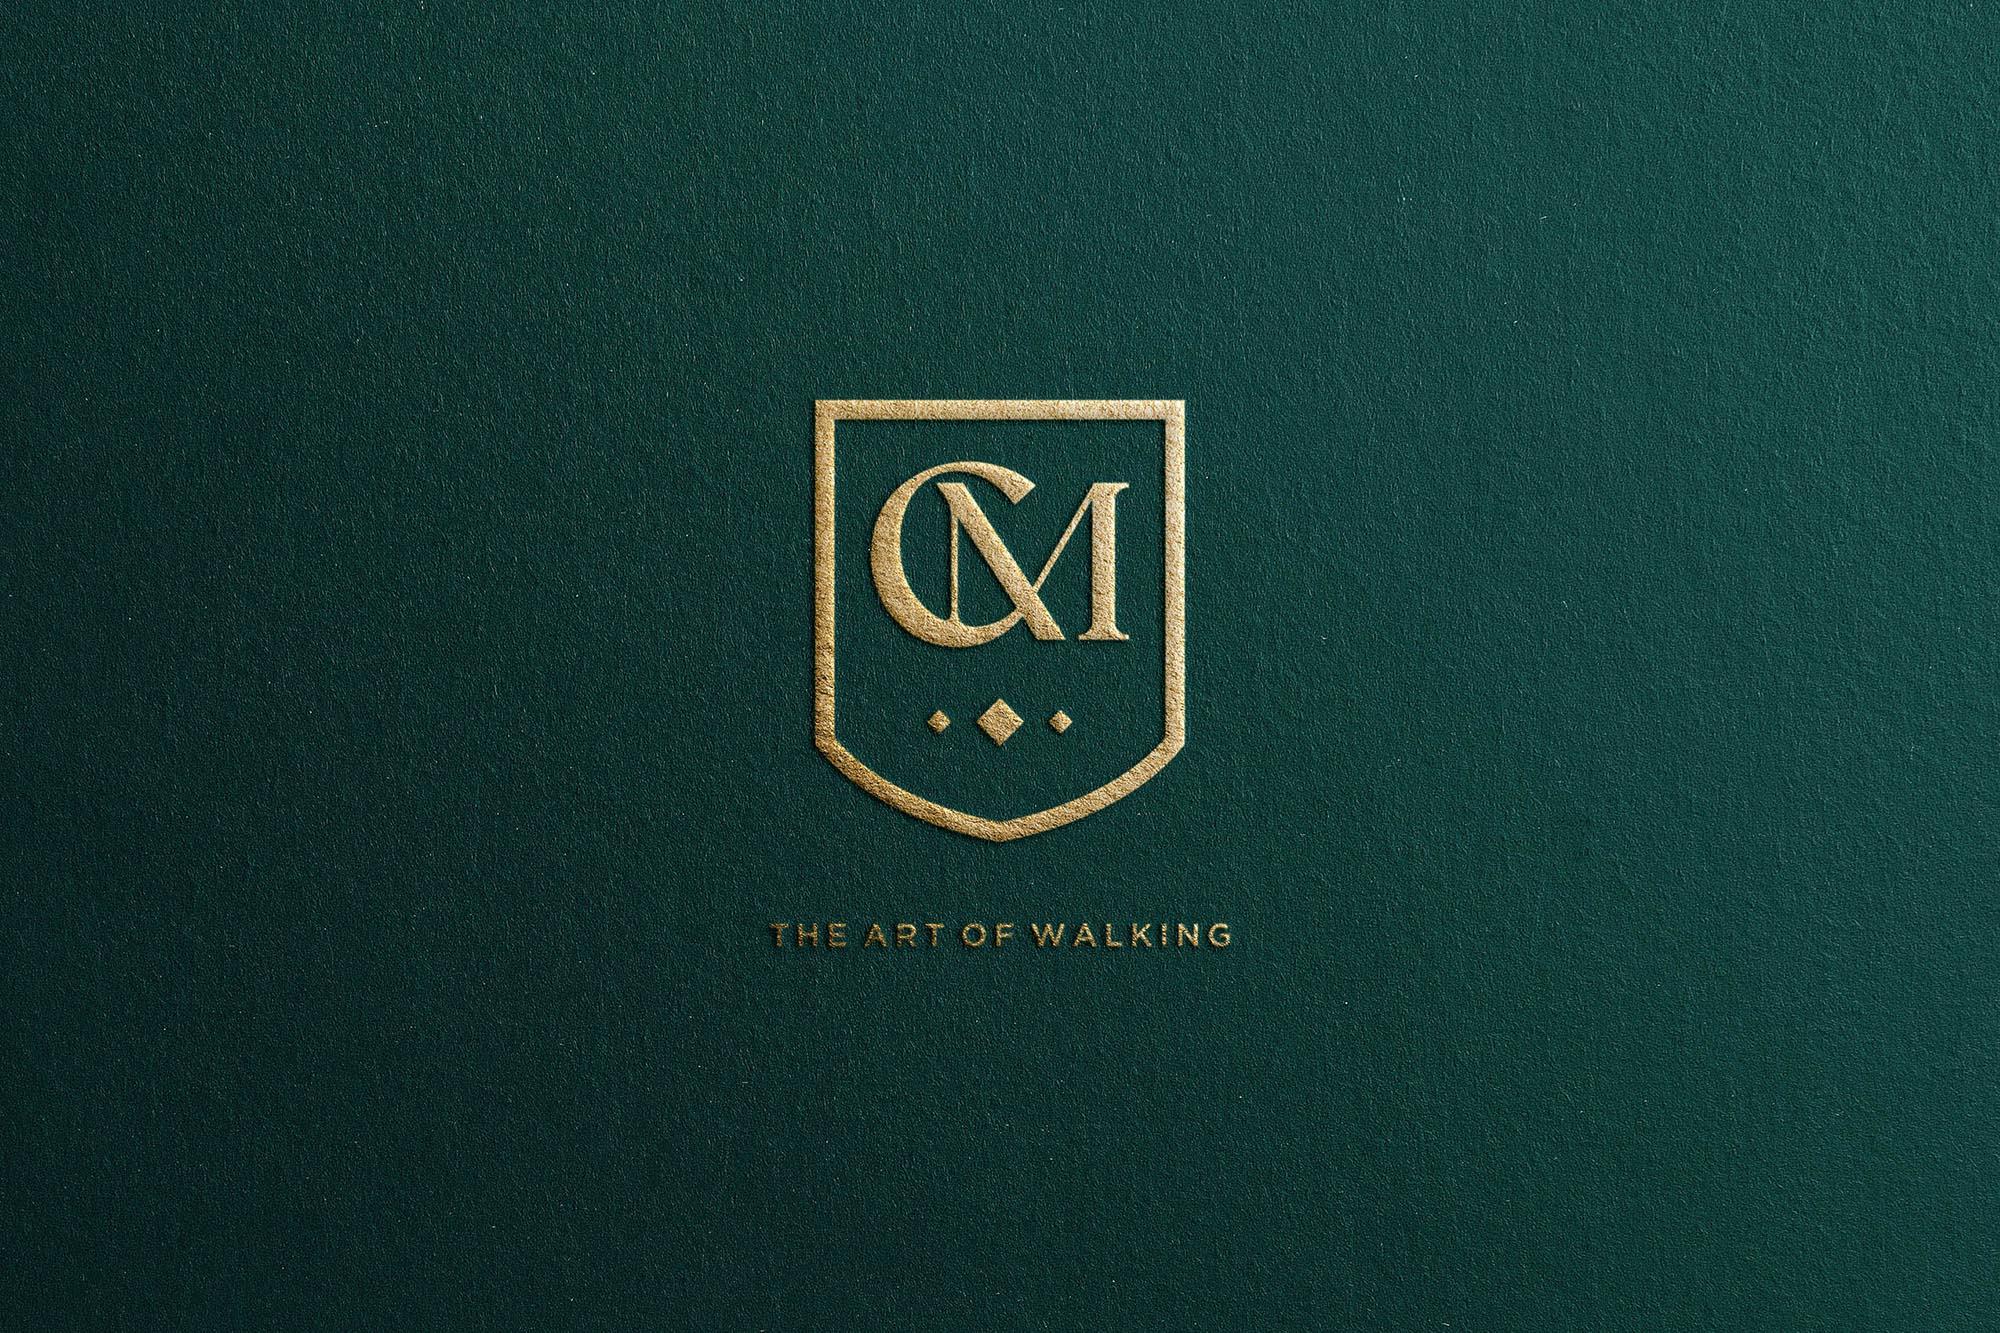 Branding for Como the Art of Walking by Cursor Design Studio